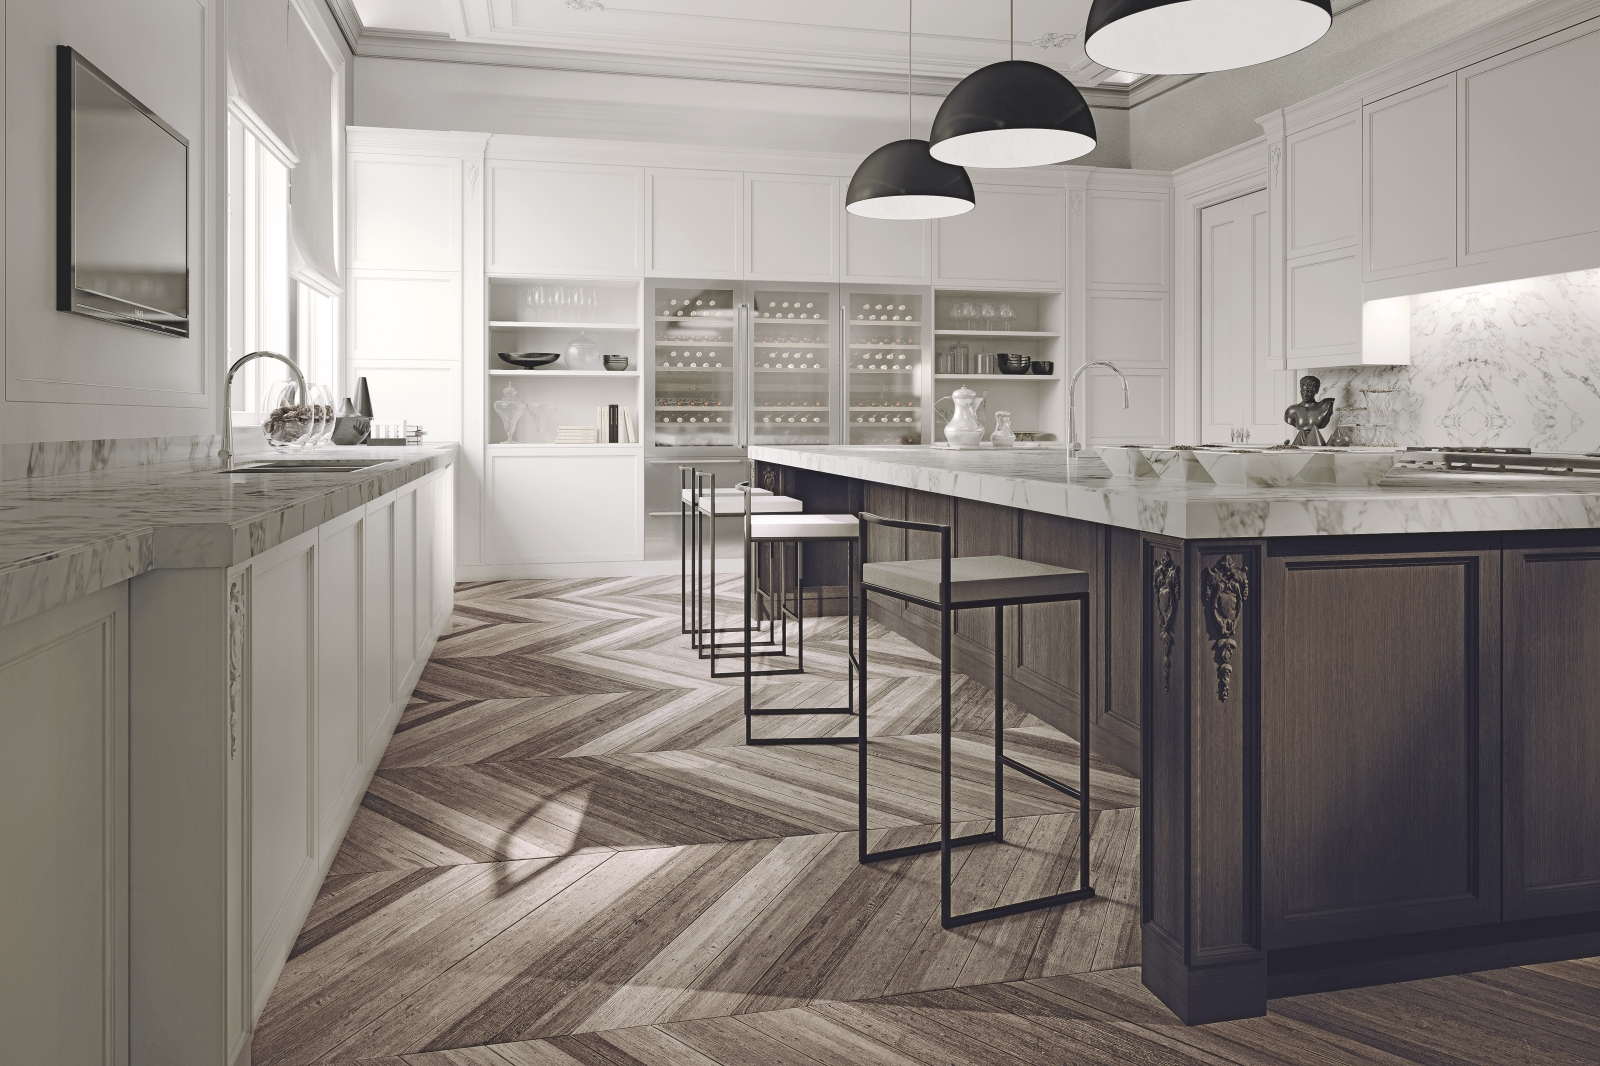 villa_borghese_kitchen_1.jpg